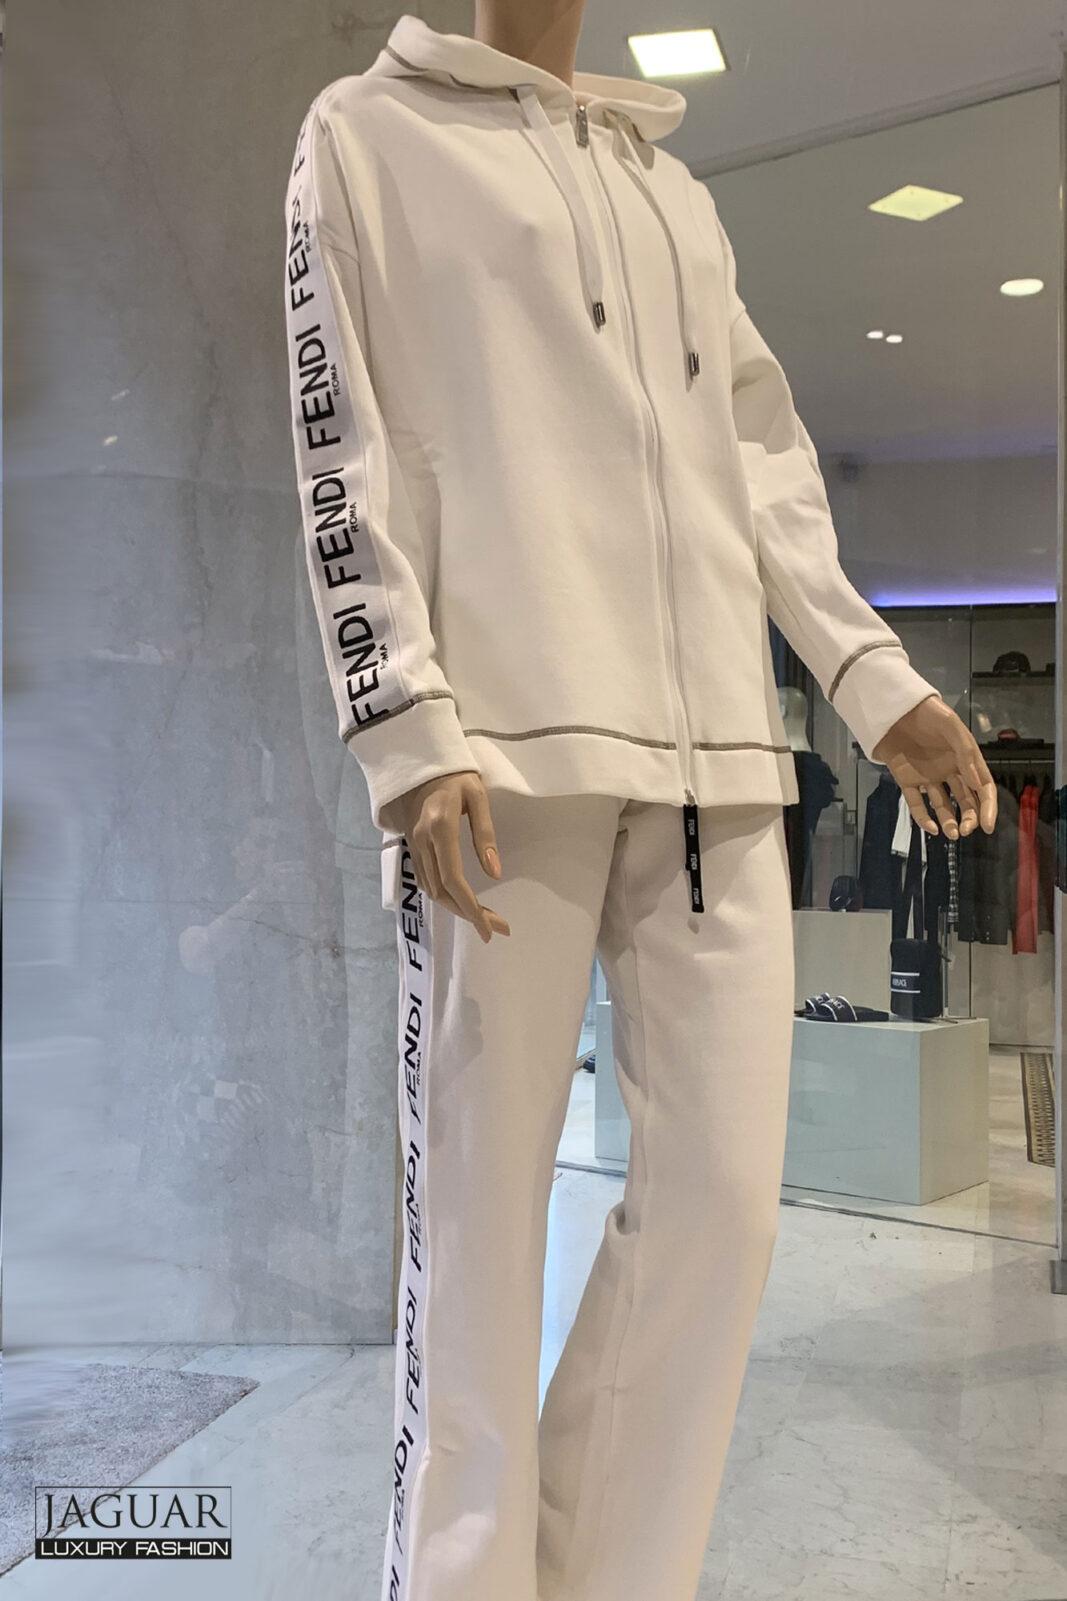 Fendi jogging suit